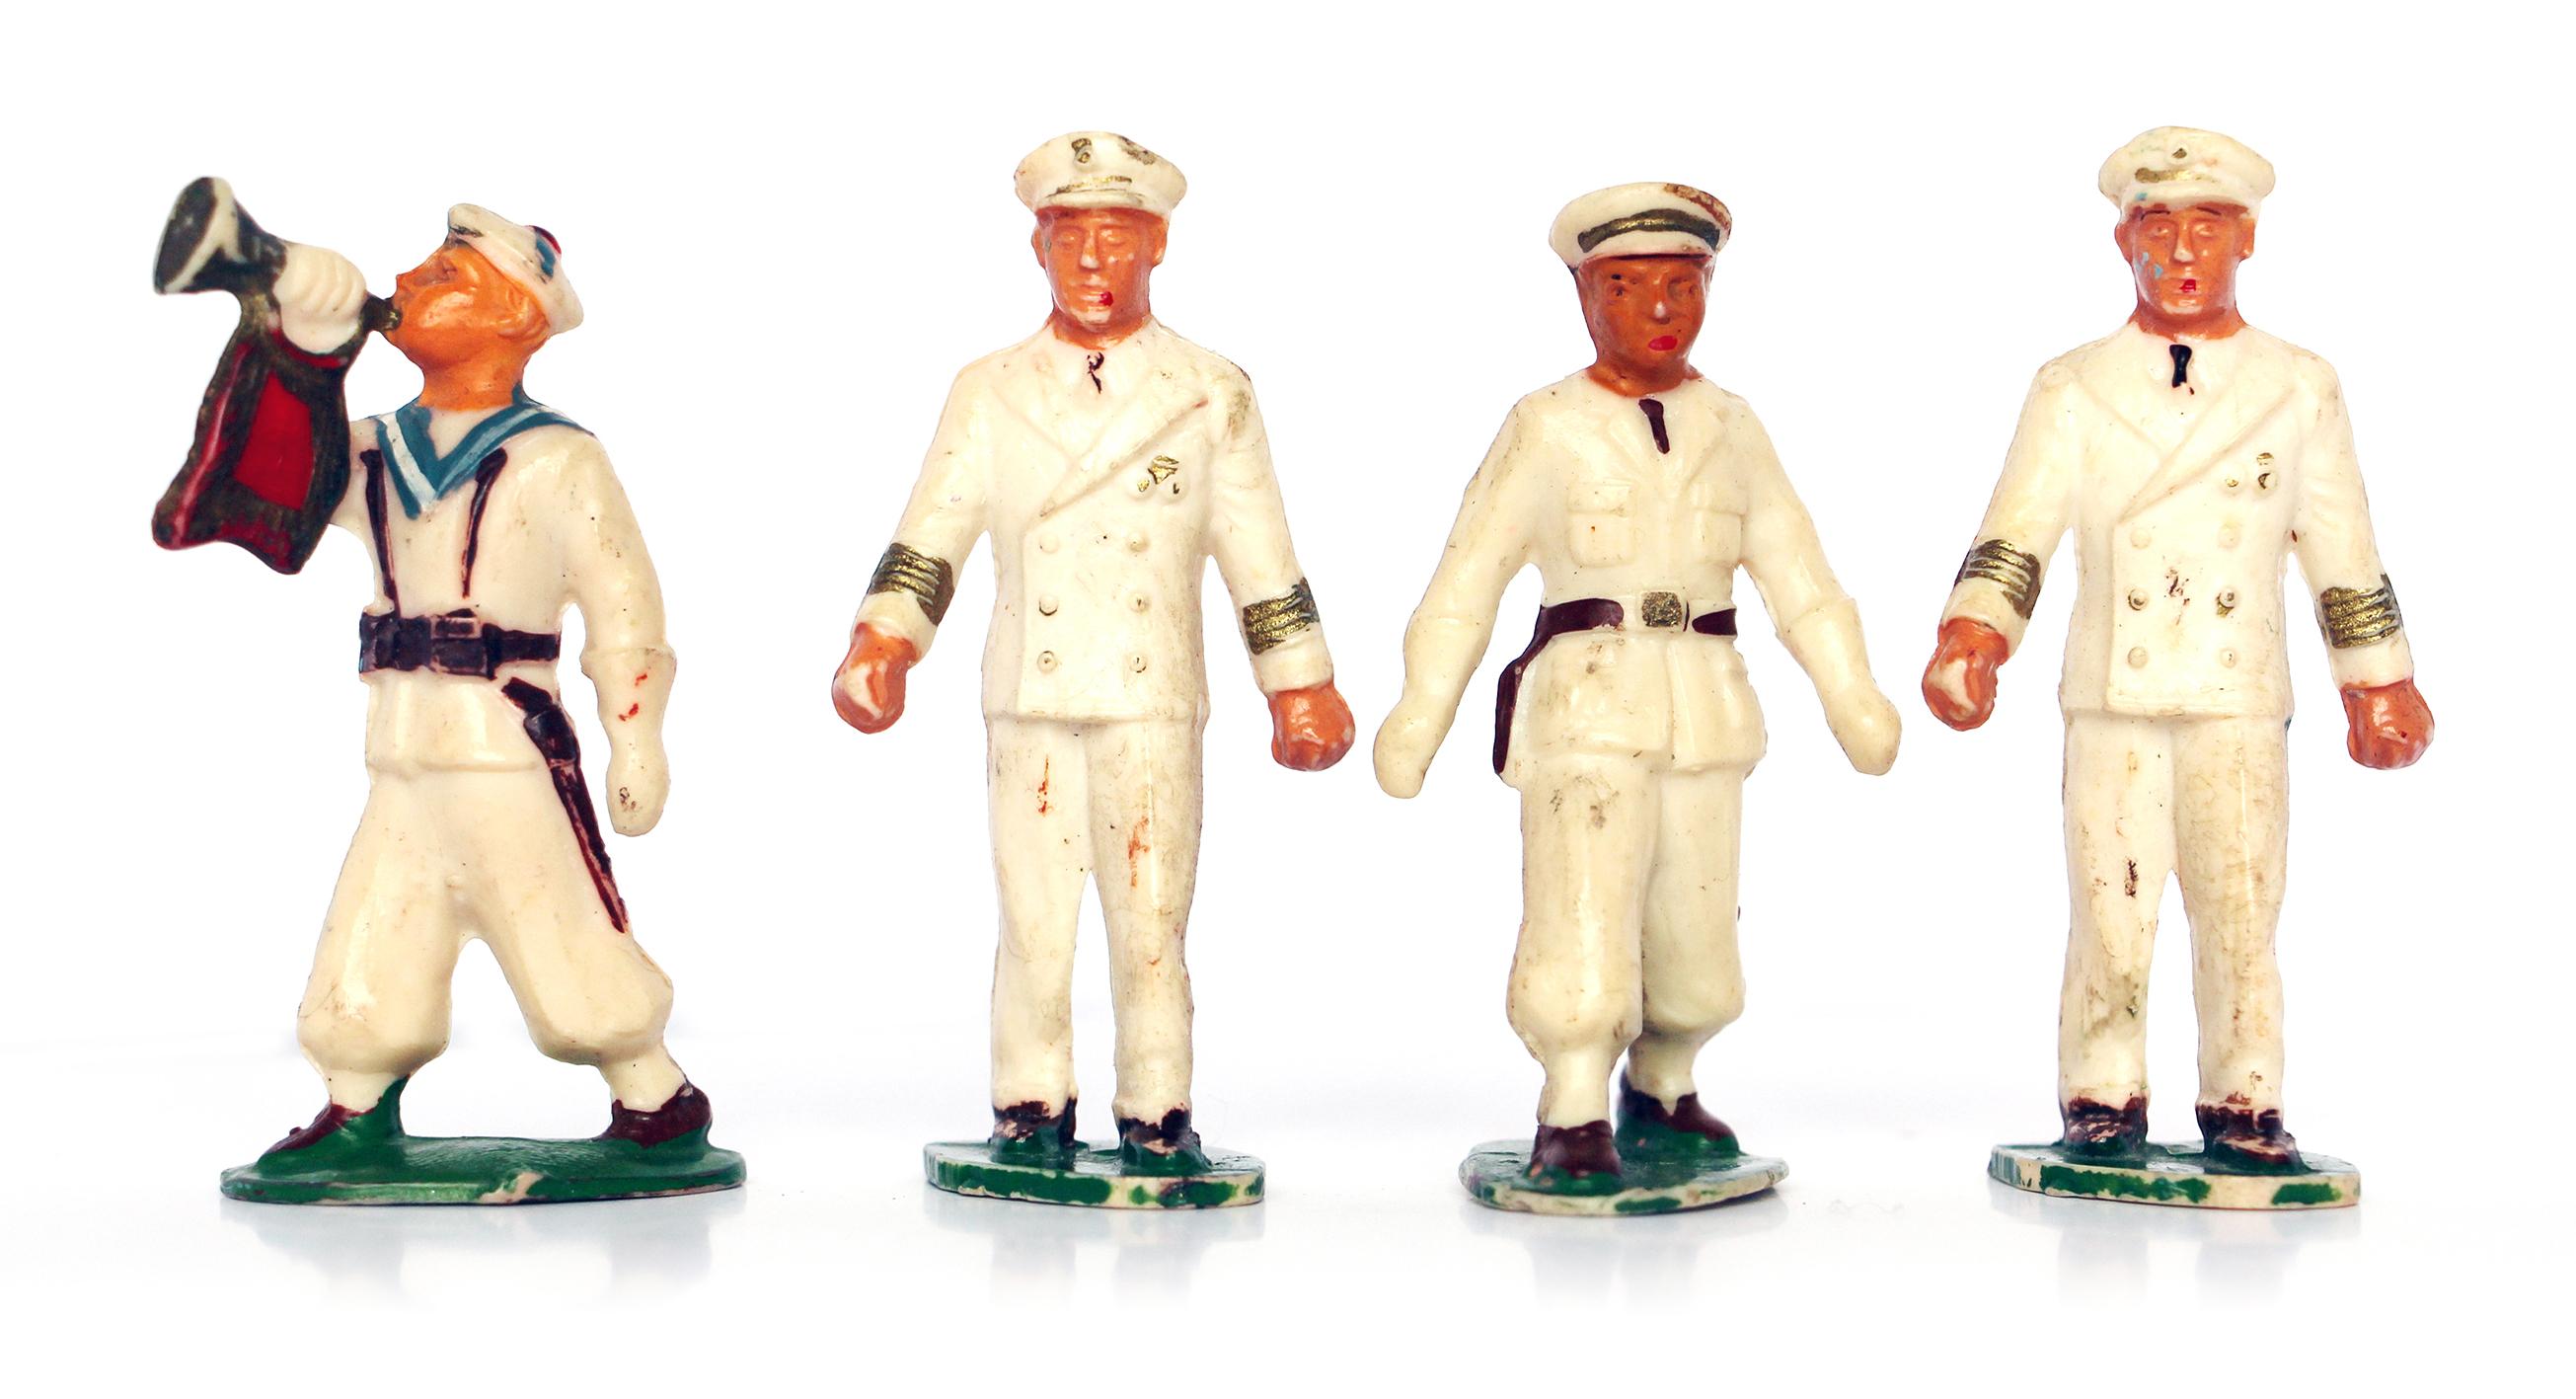 5 Figurines Starlux rondouillard - Marine - Défilé - Musique - France